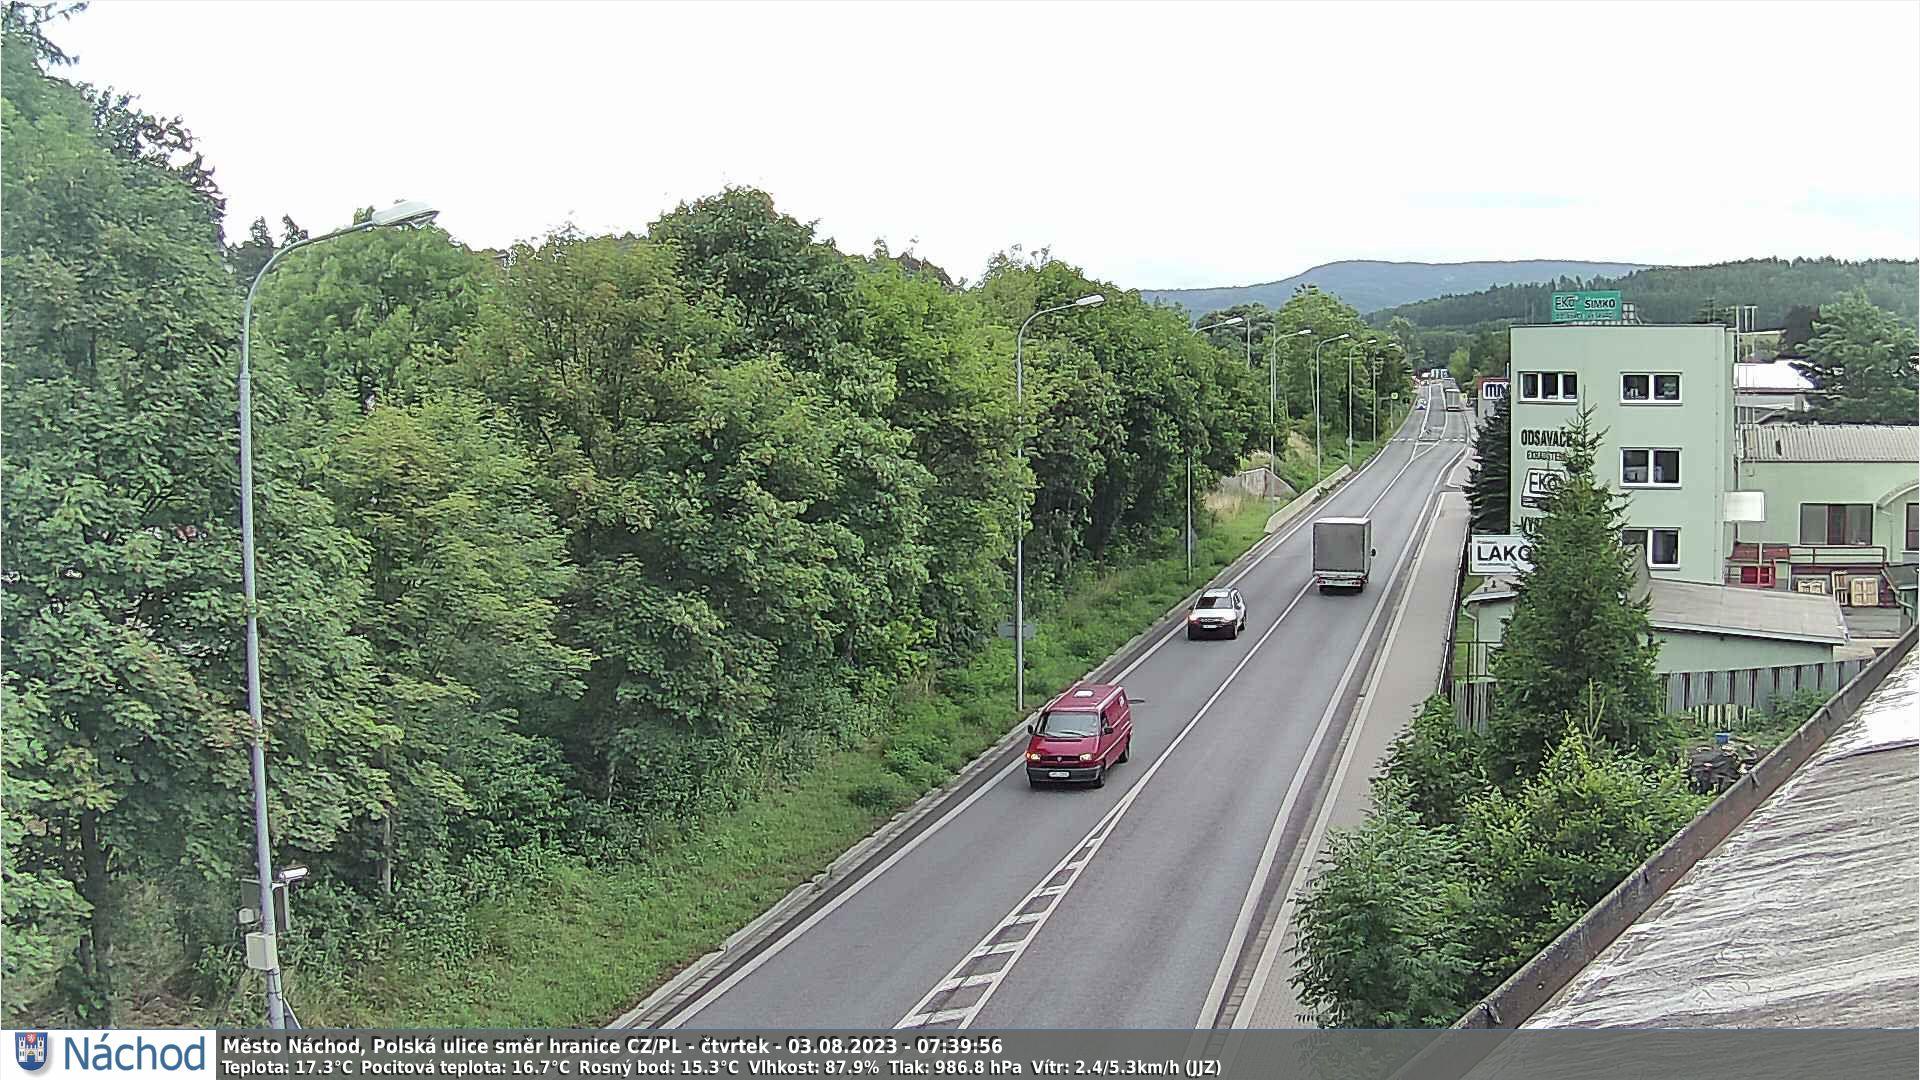 Webkamerka - Náchod, Polská ulice směr Polsko